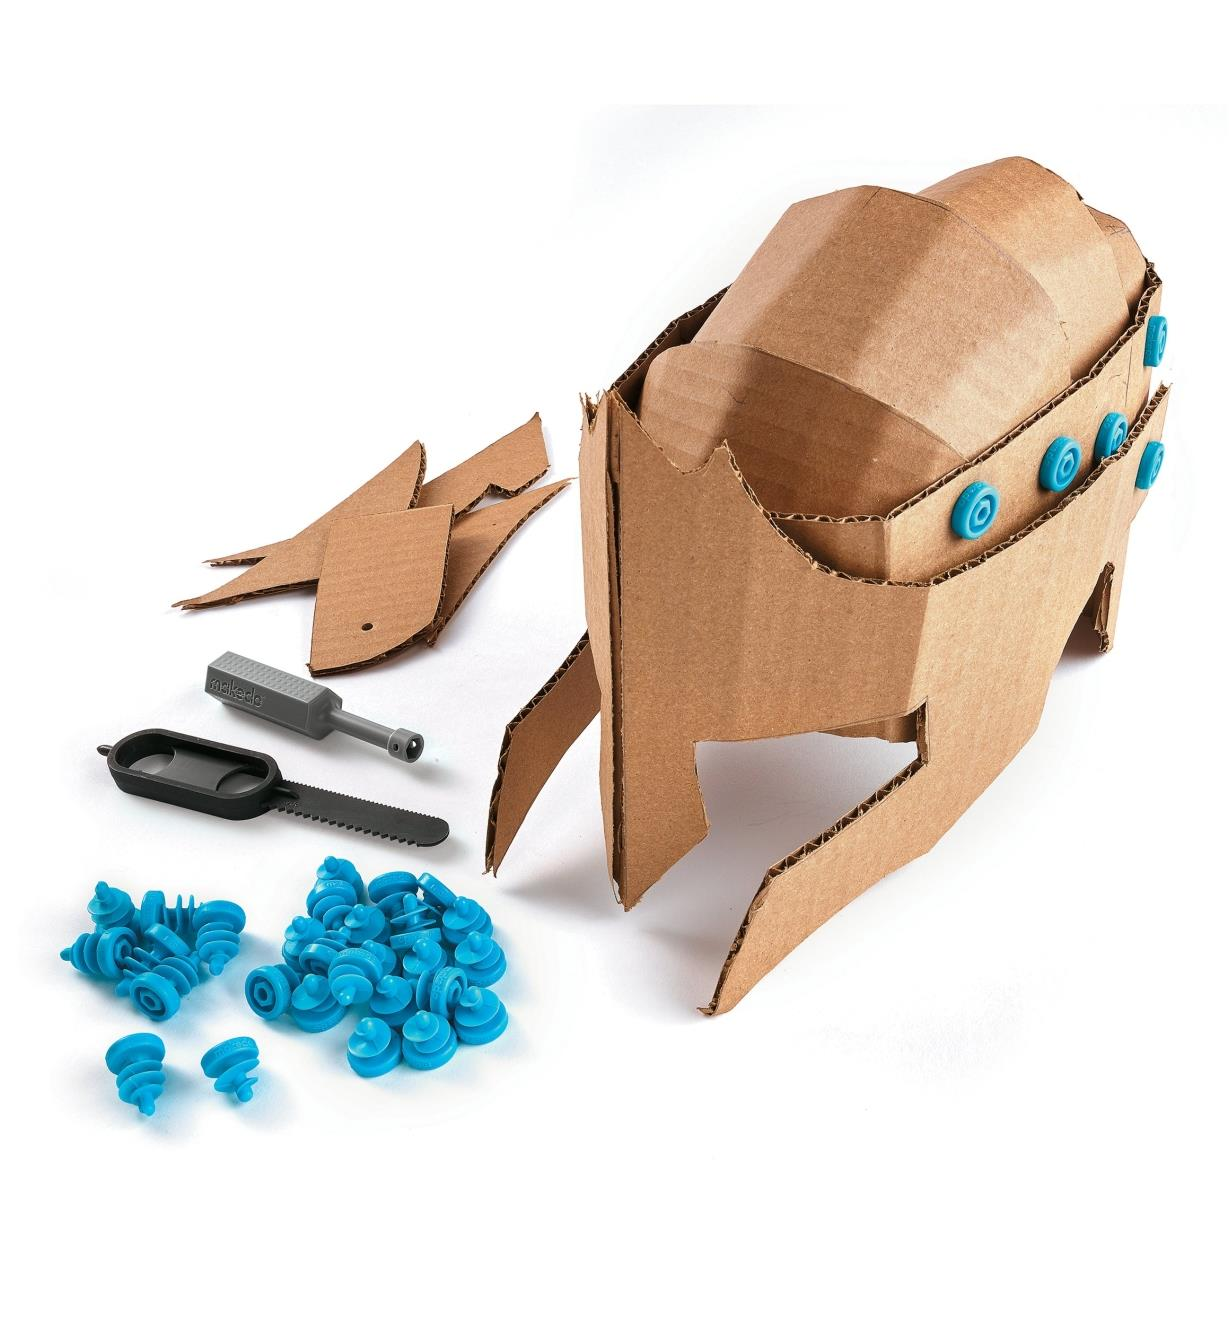 Jeu de construction pour carton ondulé Makedo